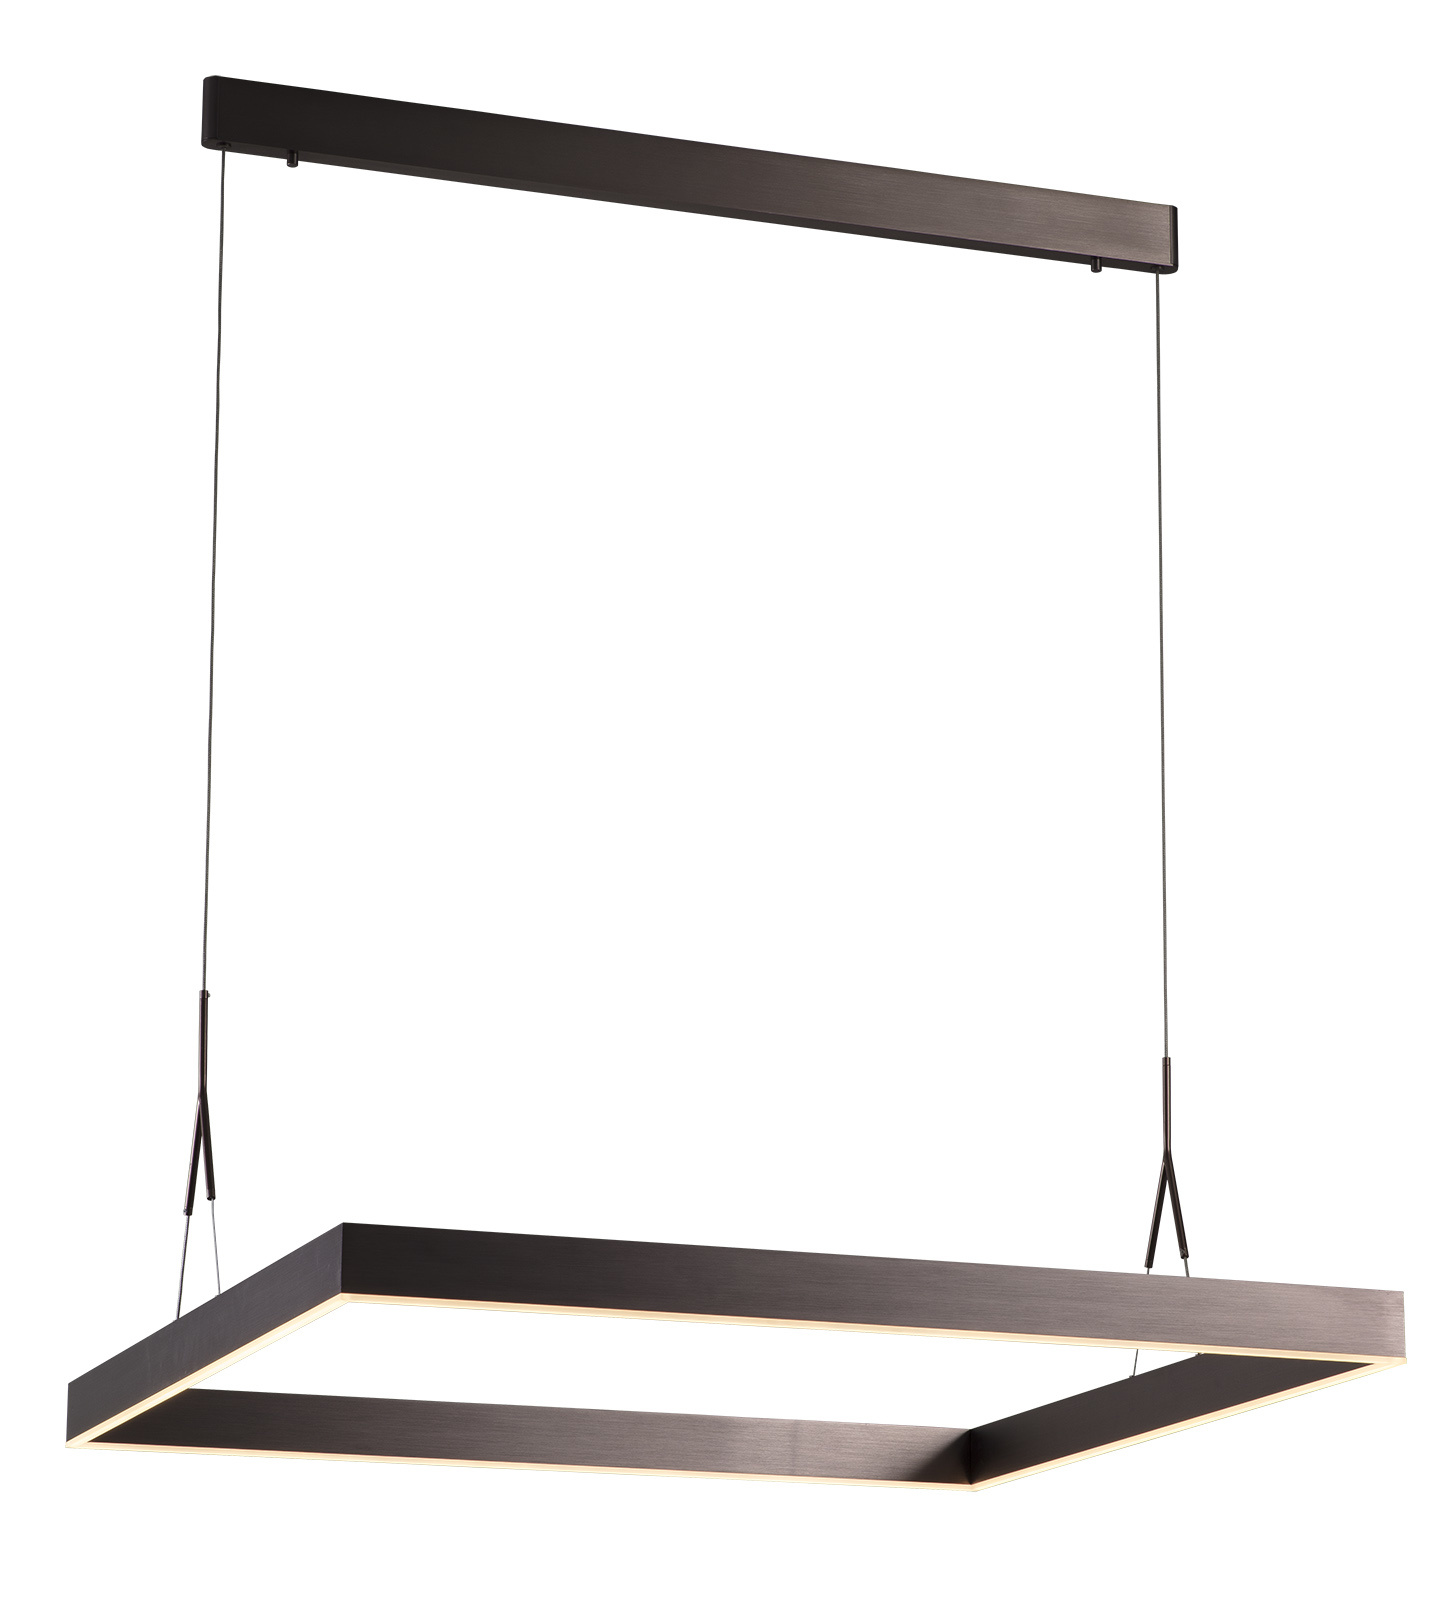 Square Pendant Light Led White Black Brown 90x90cm Myplanetled